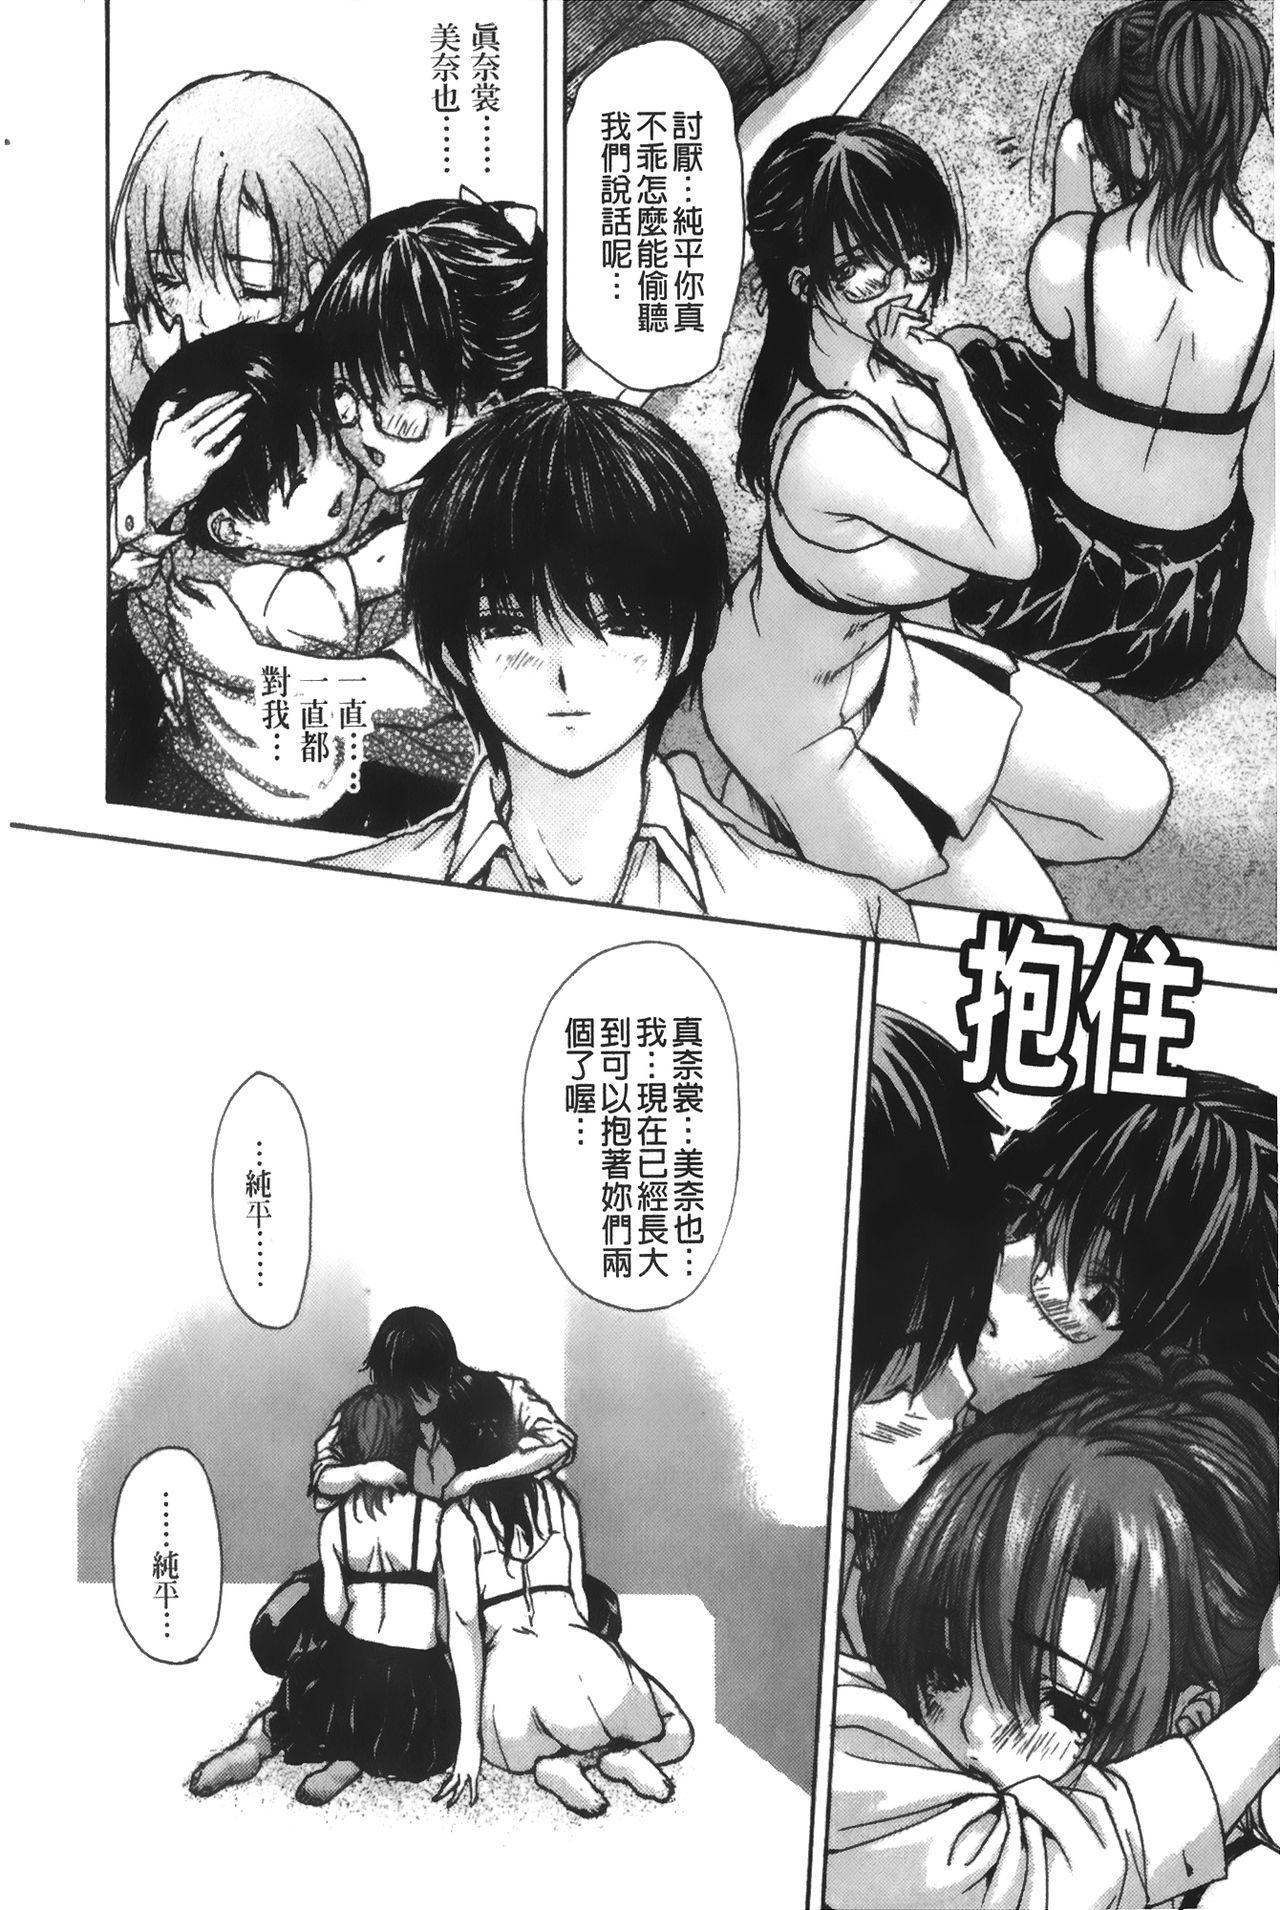 Tonari no Minano Sensei 4 | 隔壁的美奈乃老師 4 177